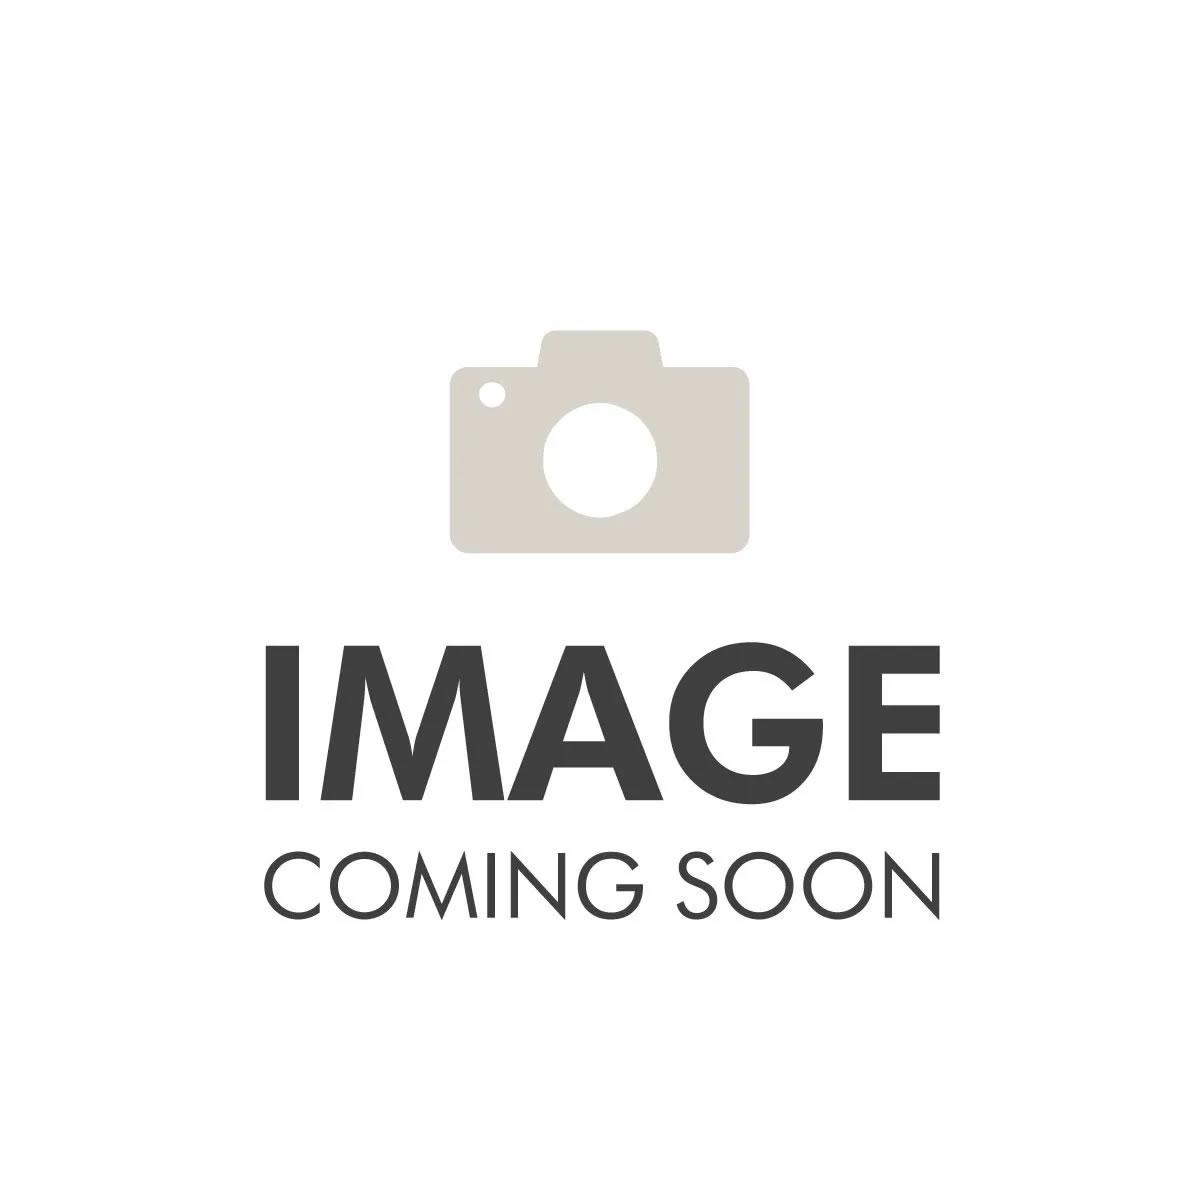 Fabric Rear Seat Covers, Tan; 03-06 Jeep Wrangler TJ